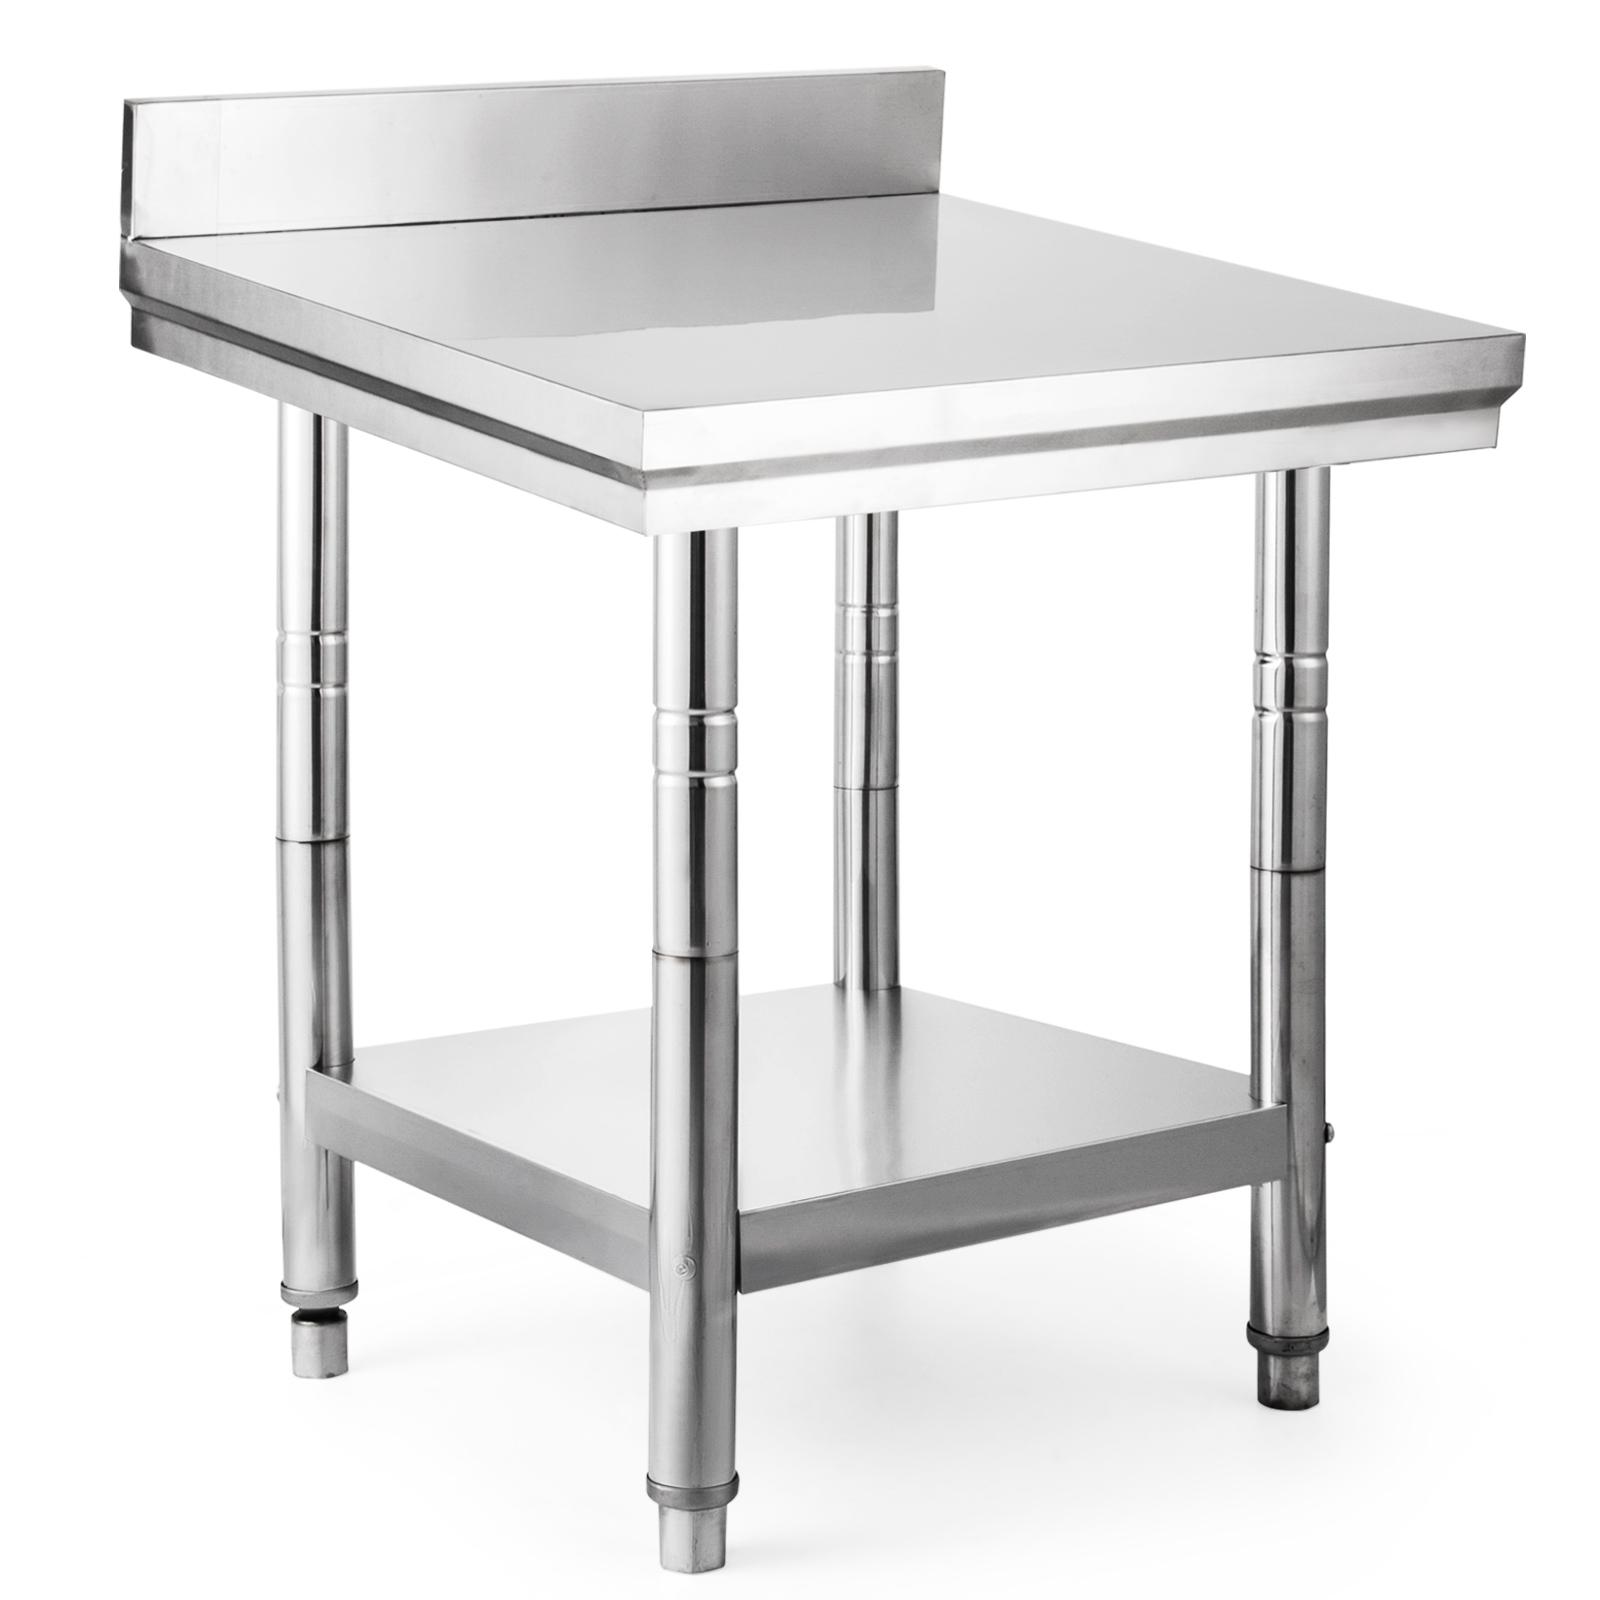 201 stainless steel kitchen work bench top food grade